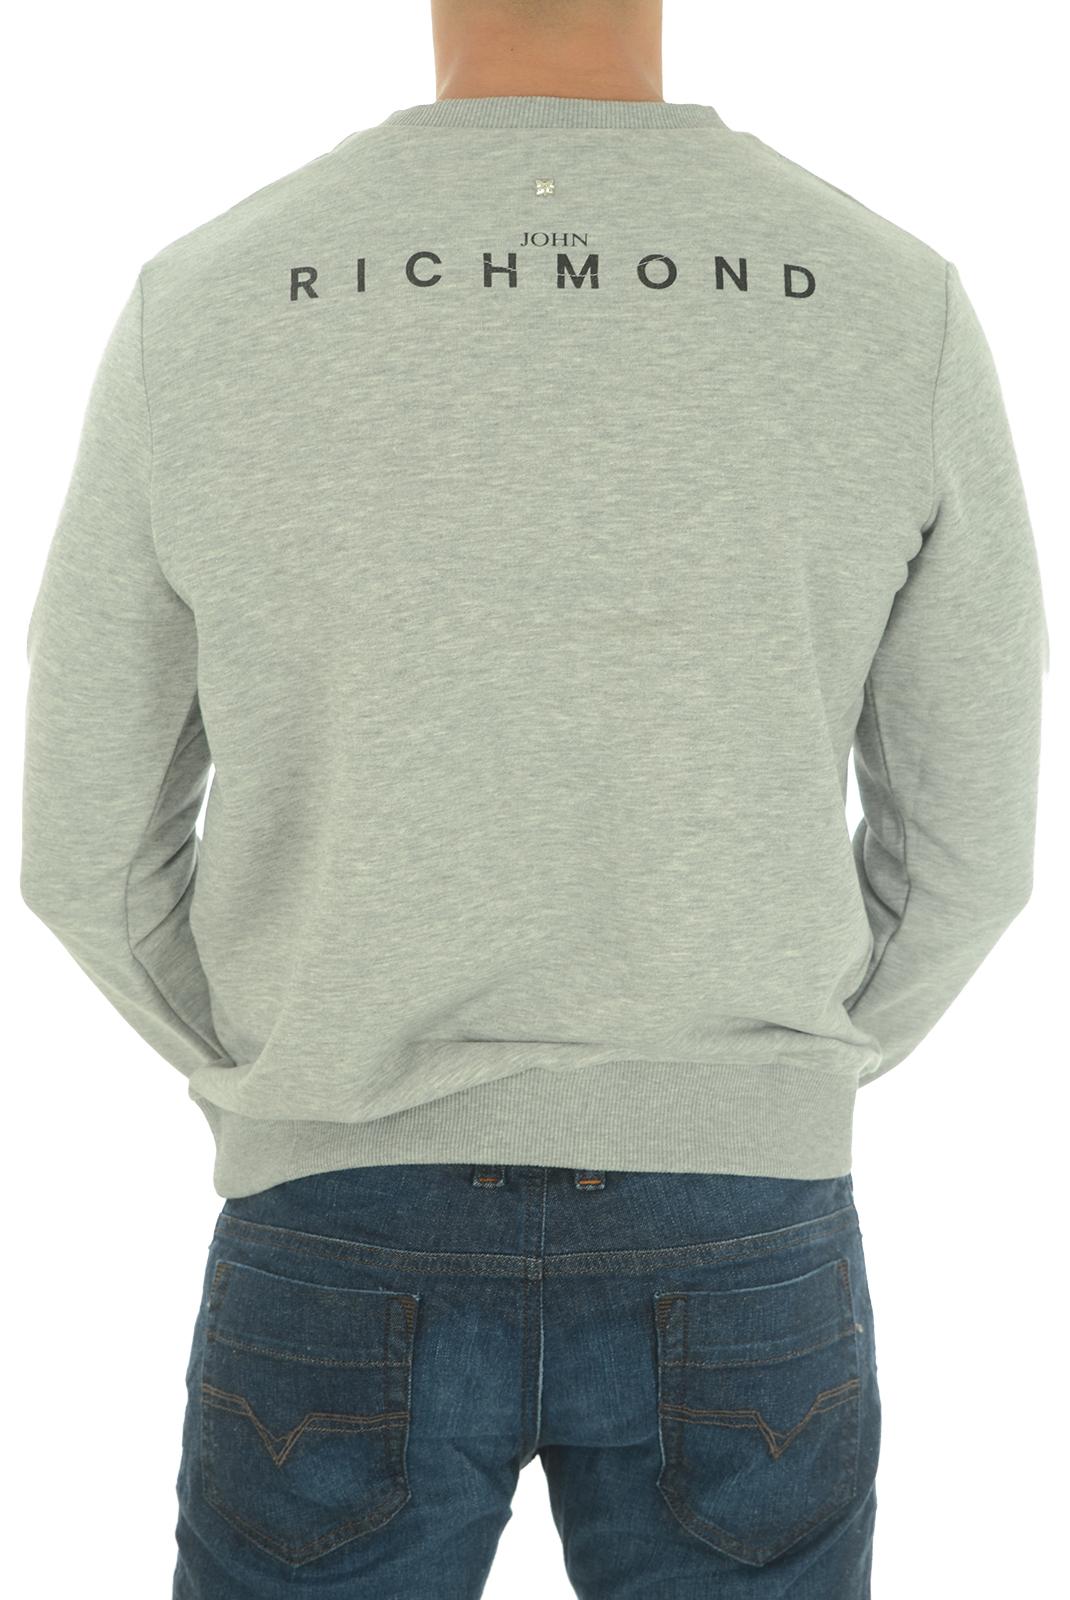 Sweatshirts  John richmond ALOANDIA W0066 GRIGIO MEL